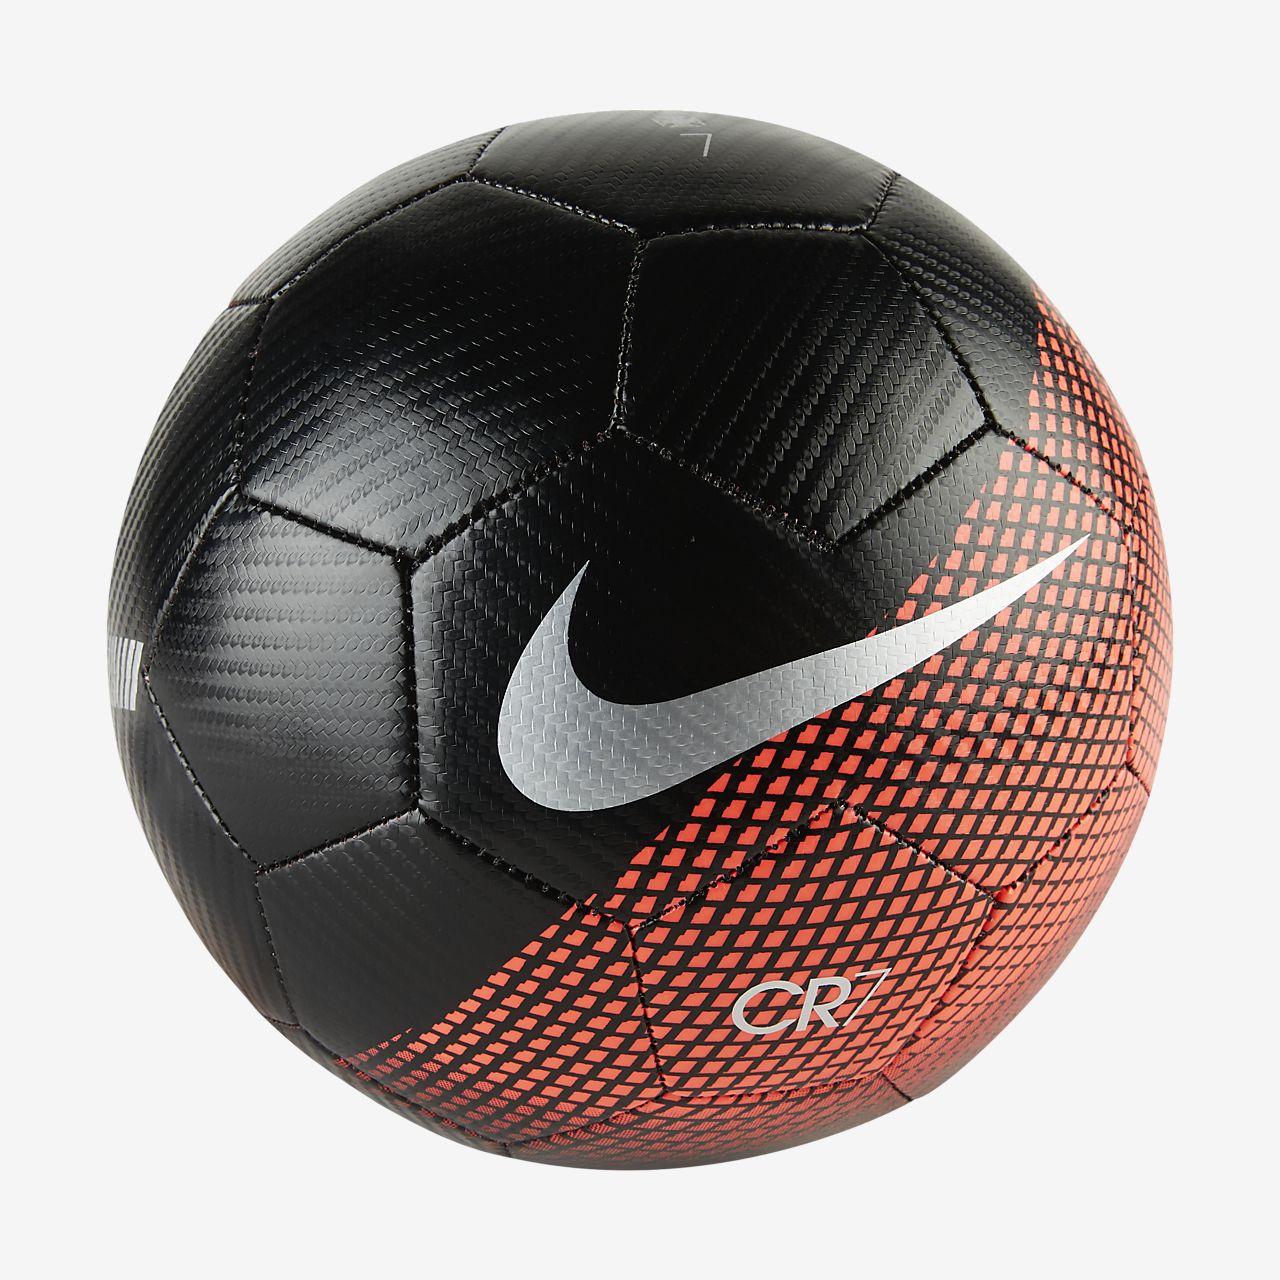 Bola de futebol Nike CR7 Prestige